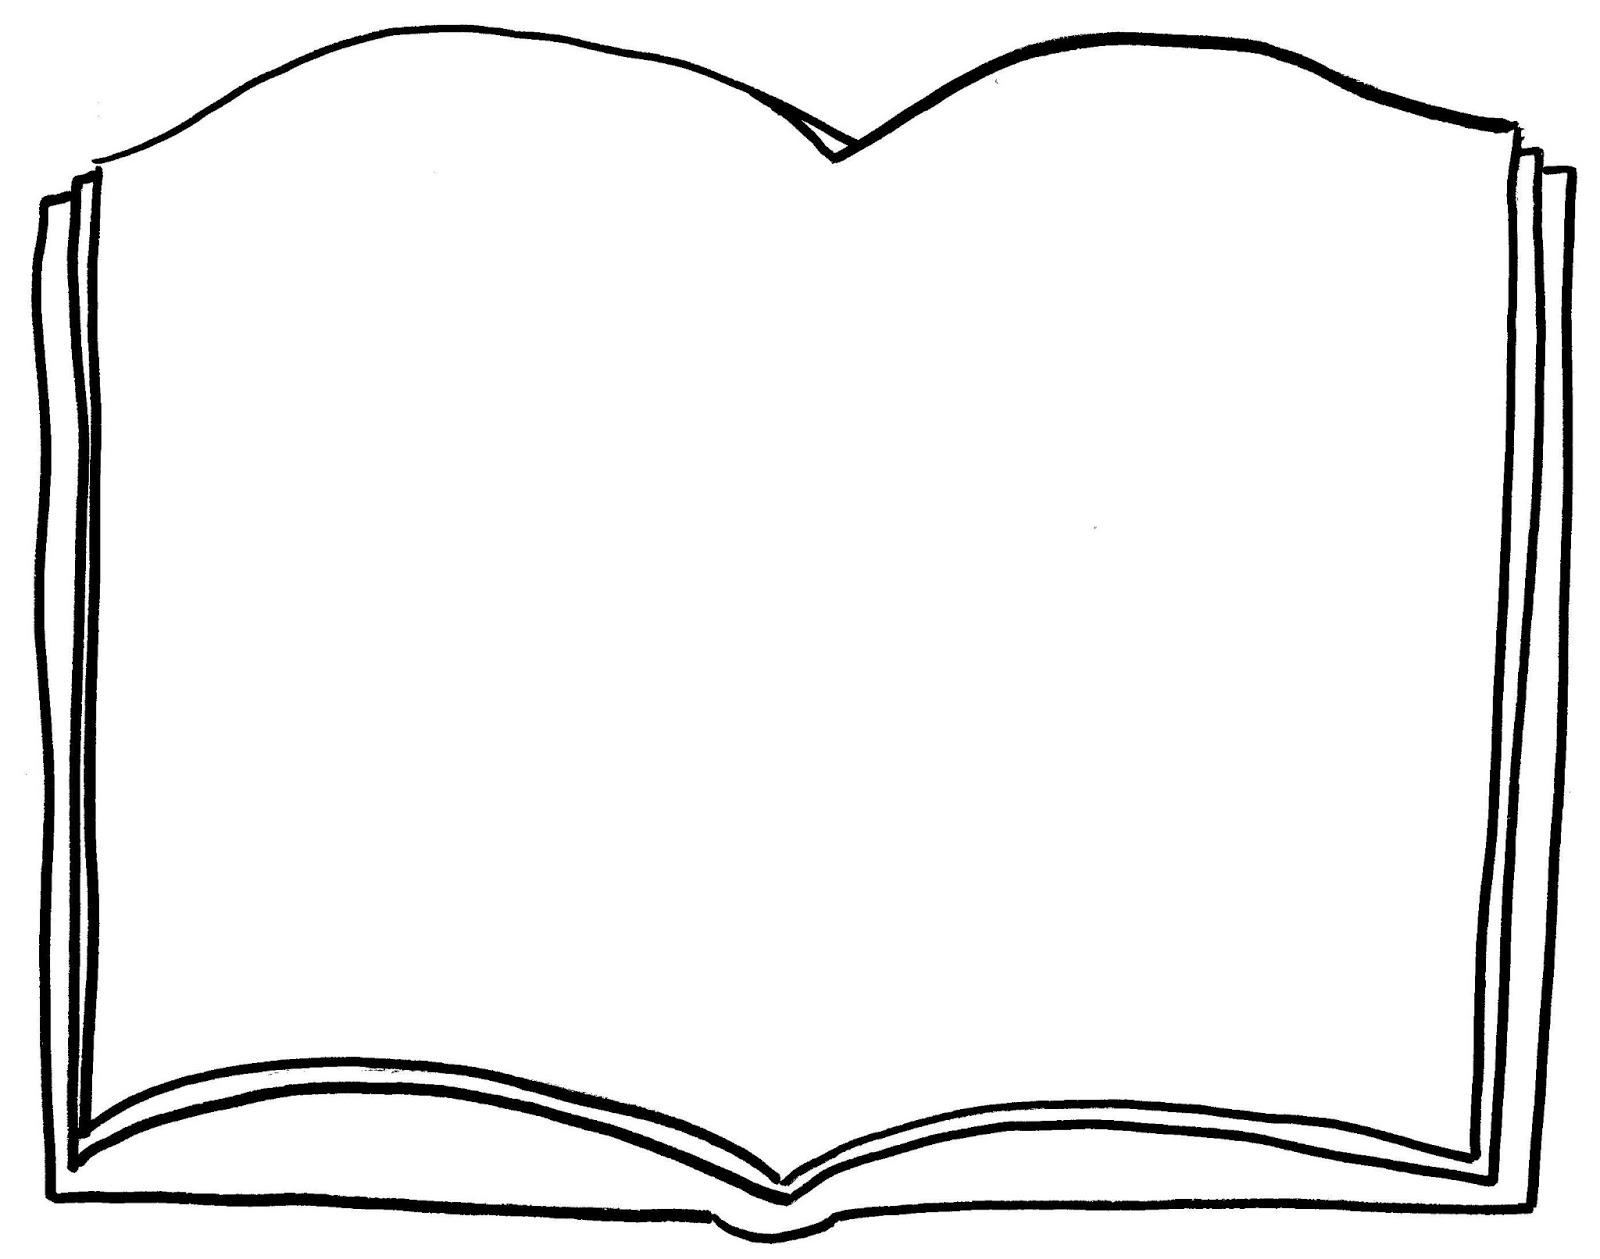 Open Book Outline Clipart